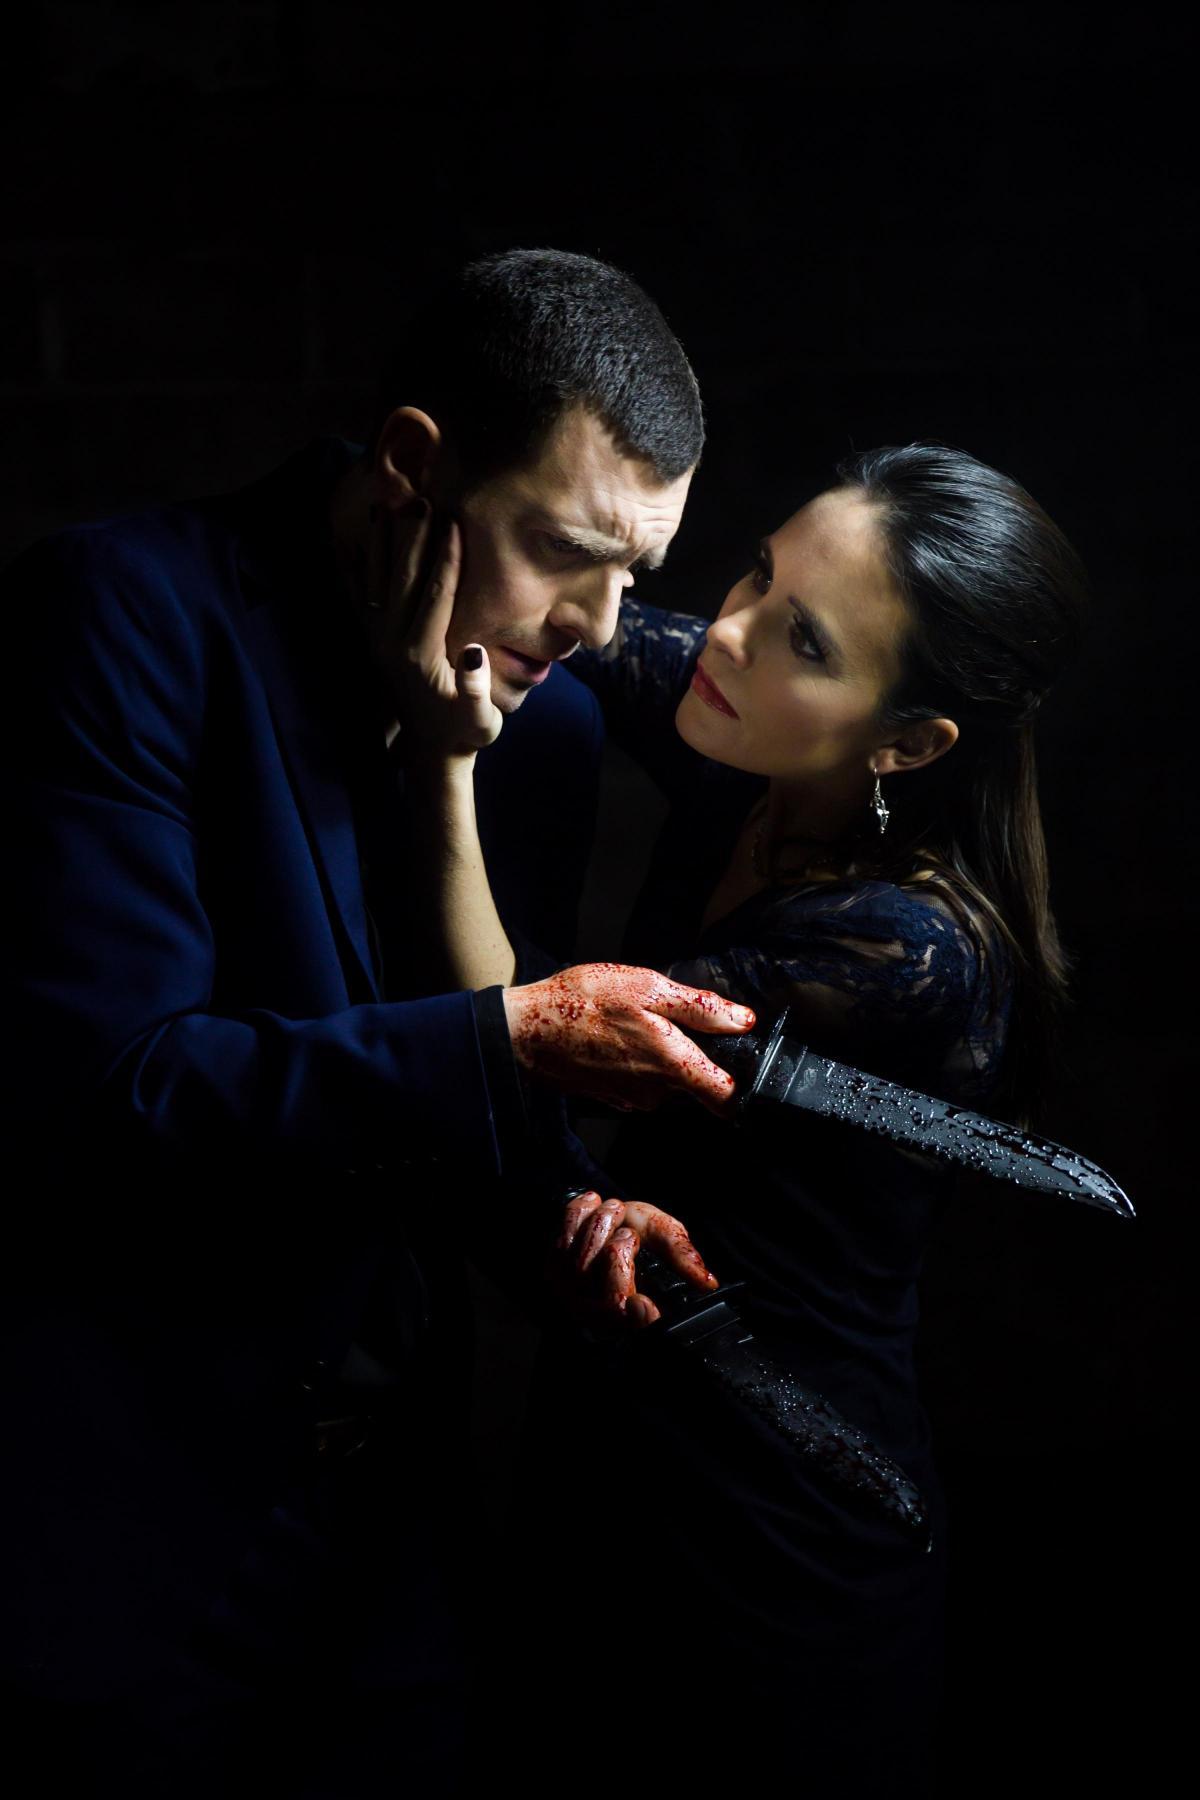 Macbeth dating